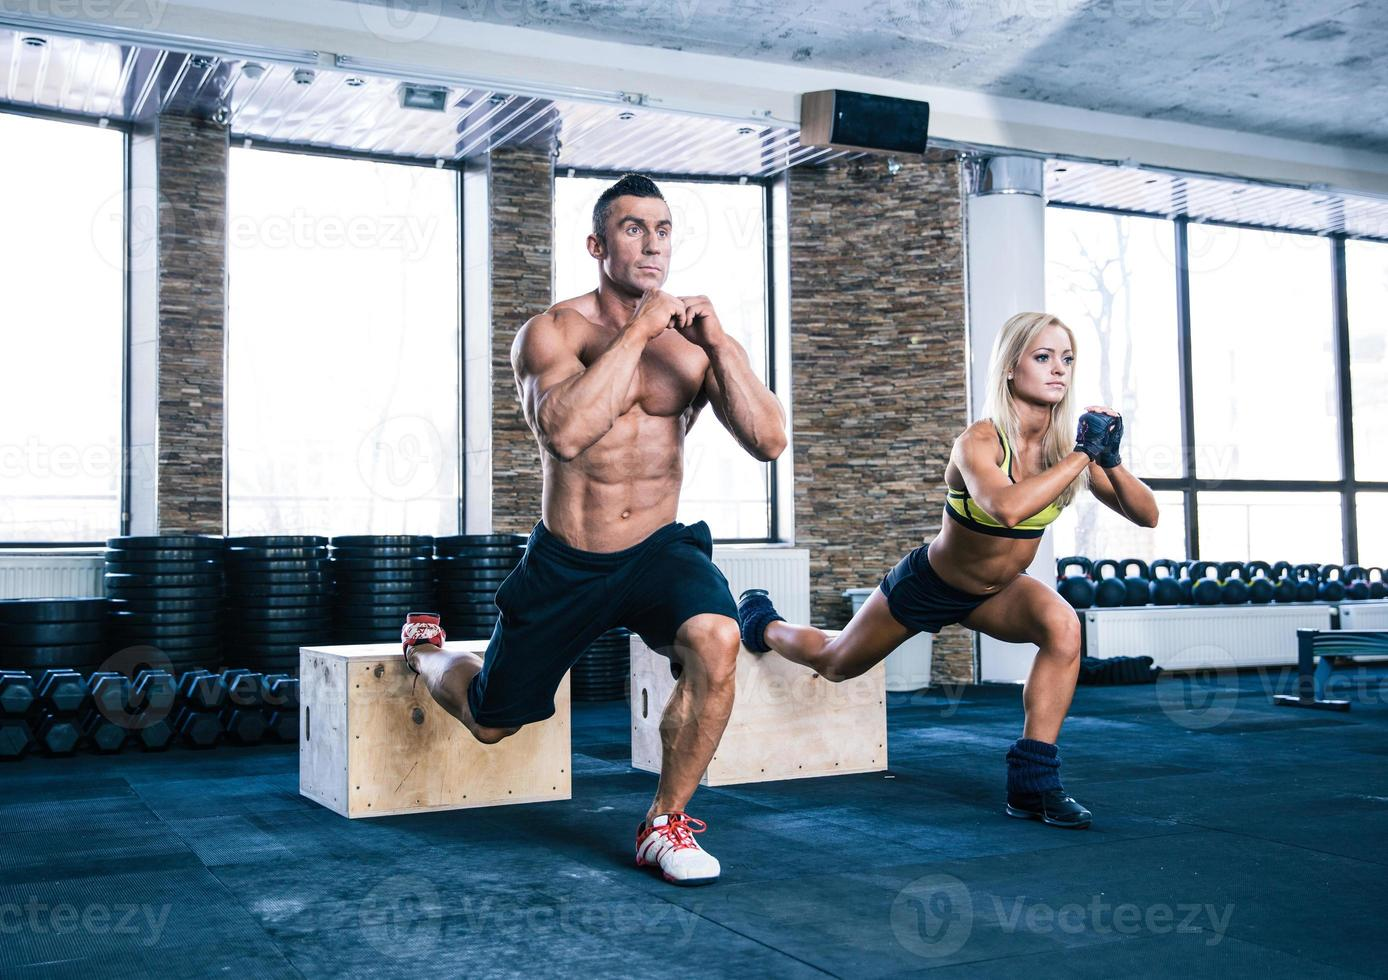 vrouw en man trainen in de sportschool foto